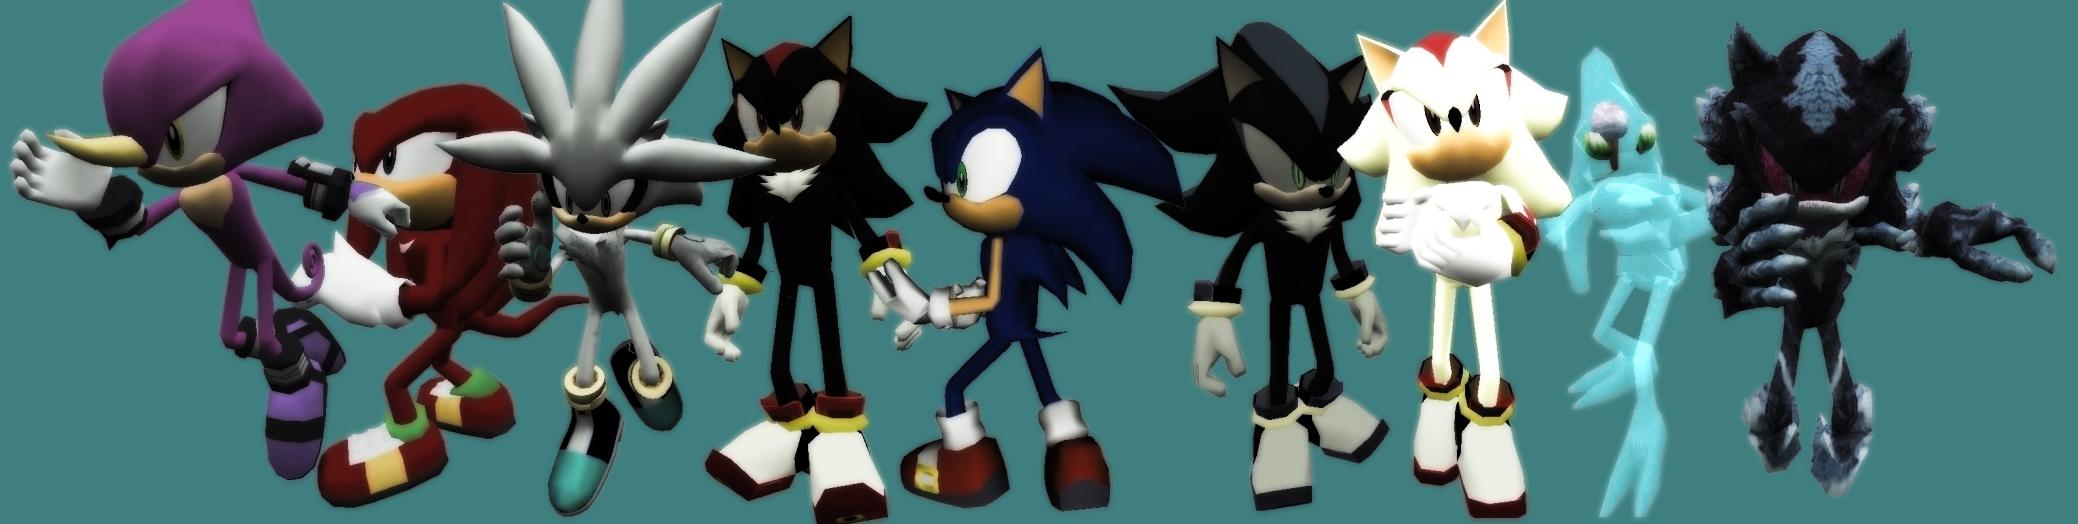 Sonic Models